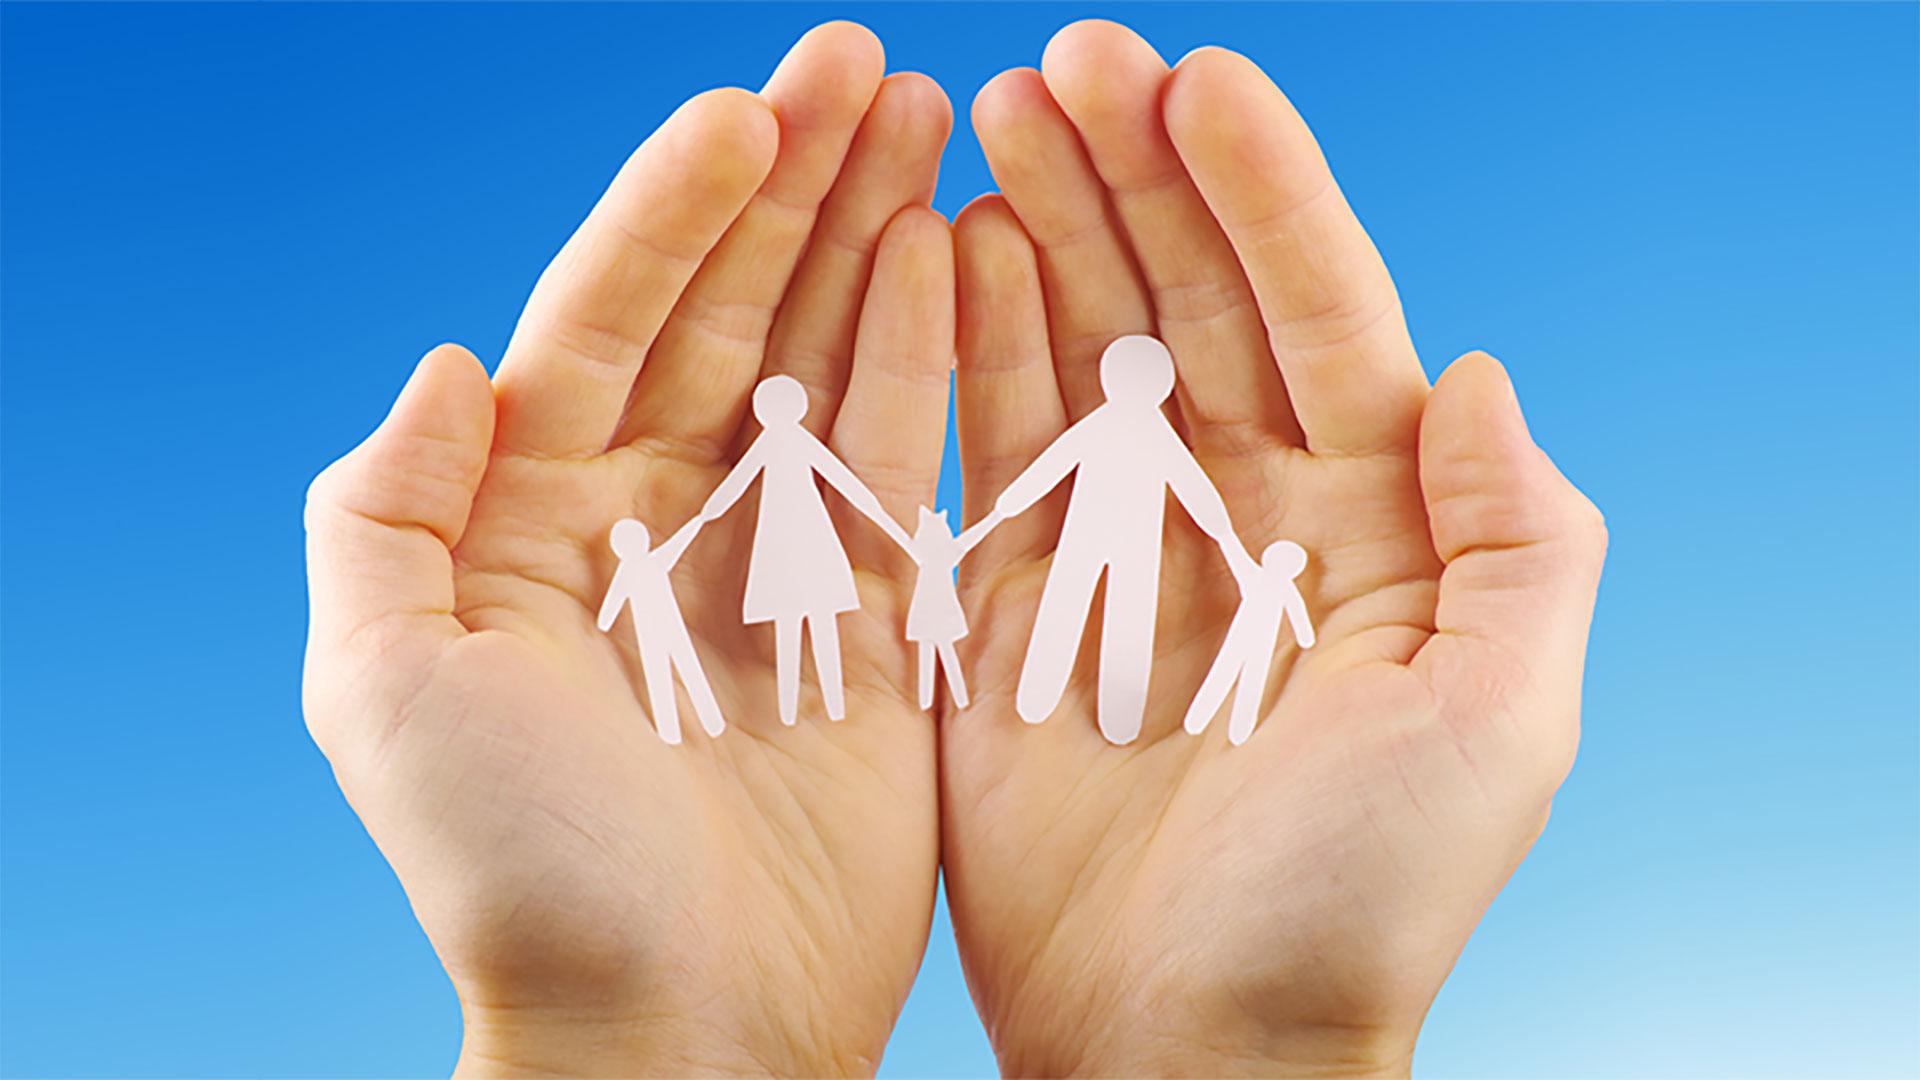 21st CENTURY PARENTING | Must Read